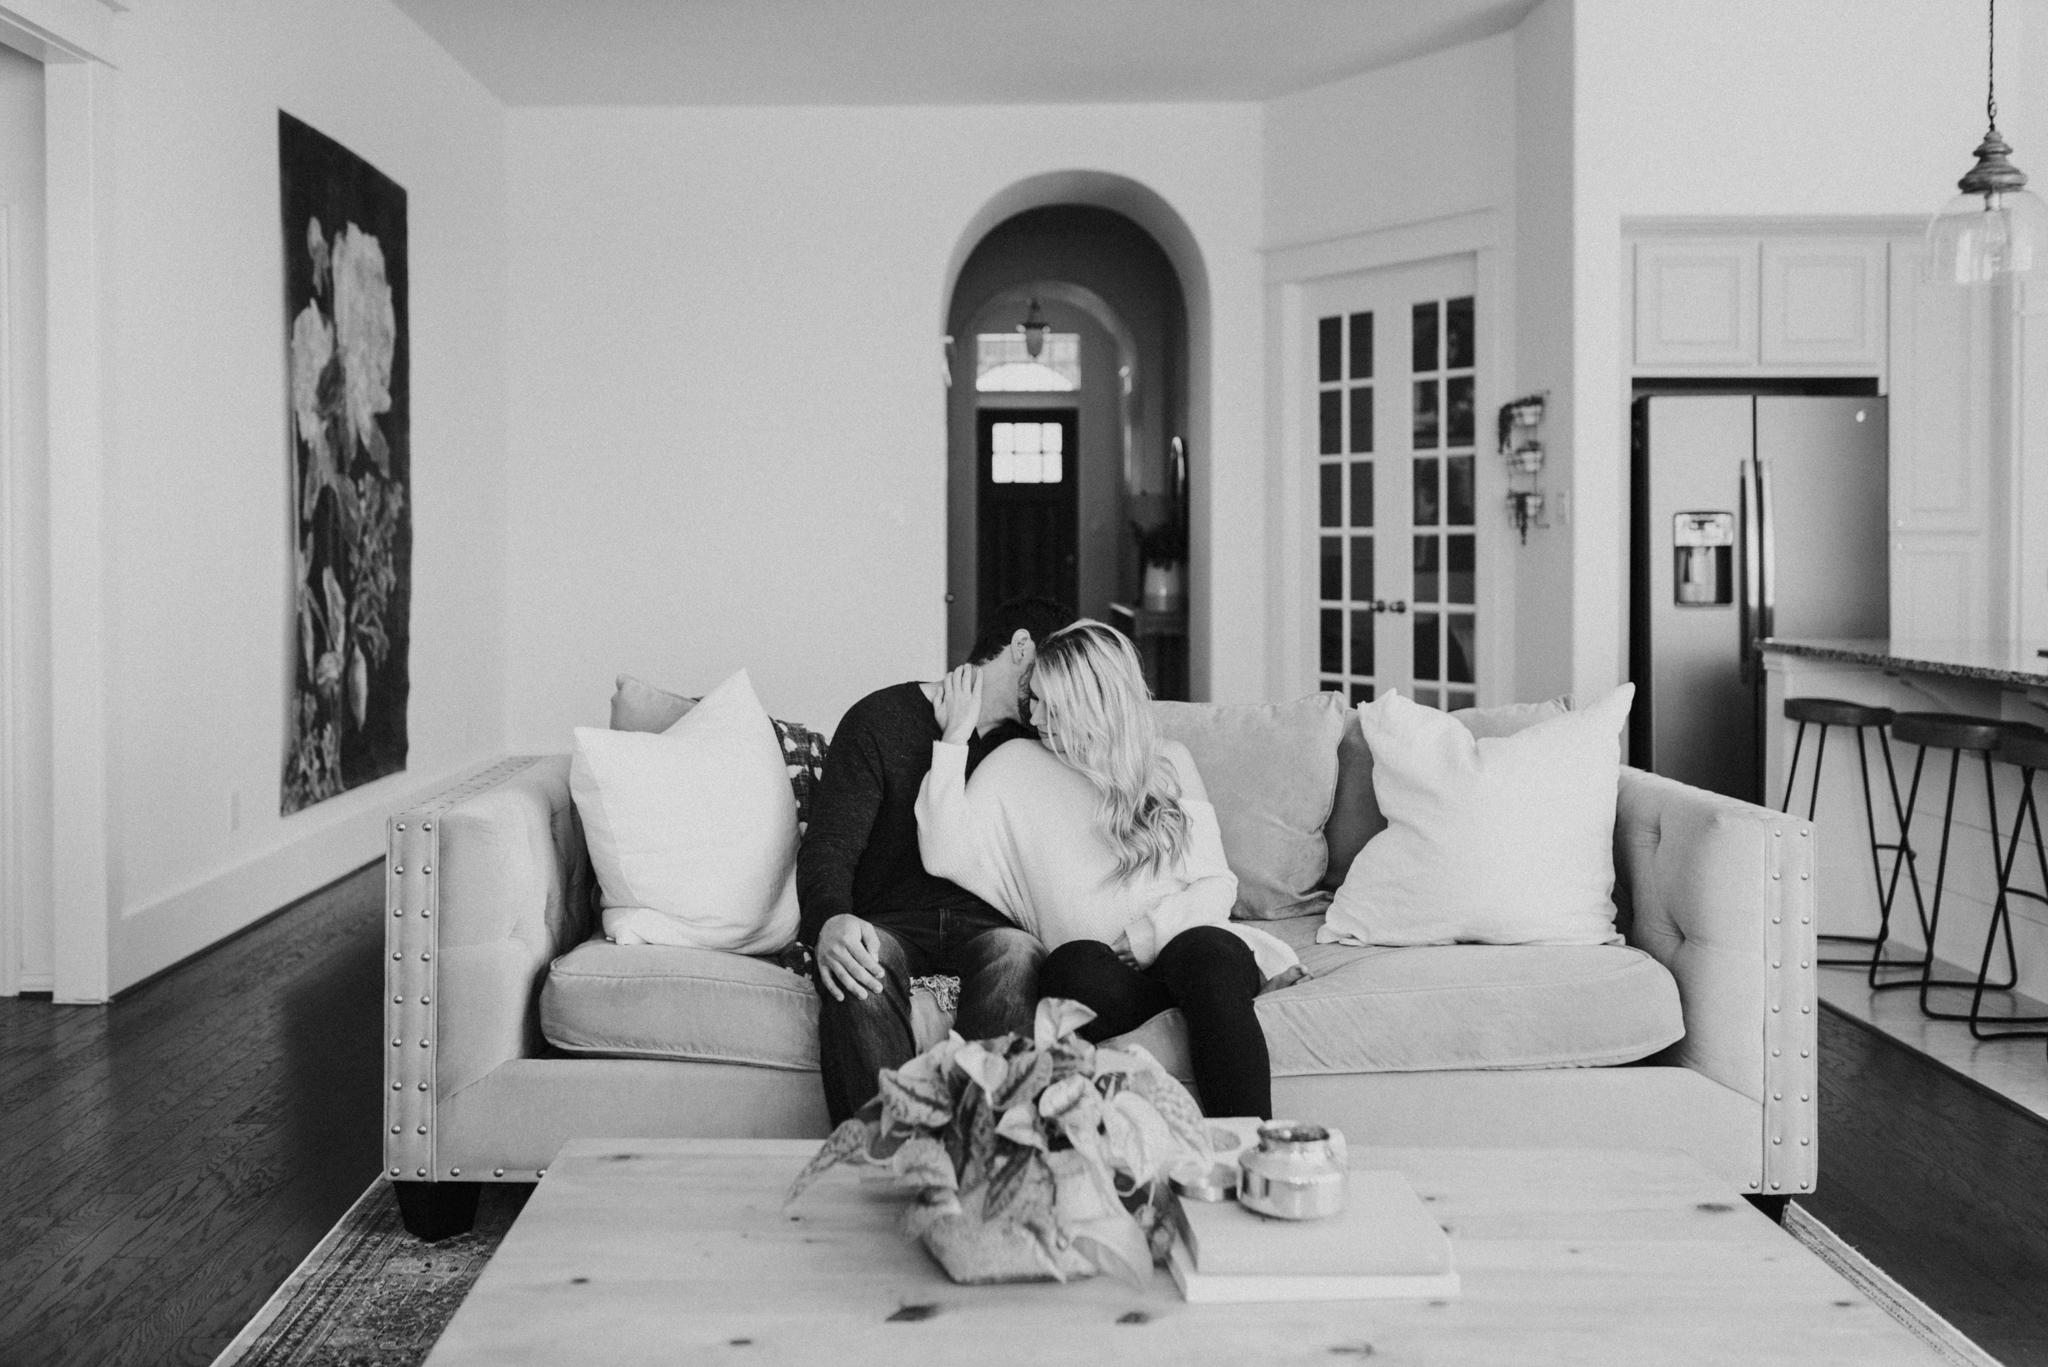 houston-wedding-photographer-in-home-maternity-session-puppies- Houston Wedding Photographer -Kristen Giles Photography-4.jpg